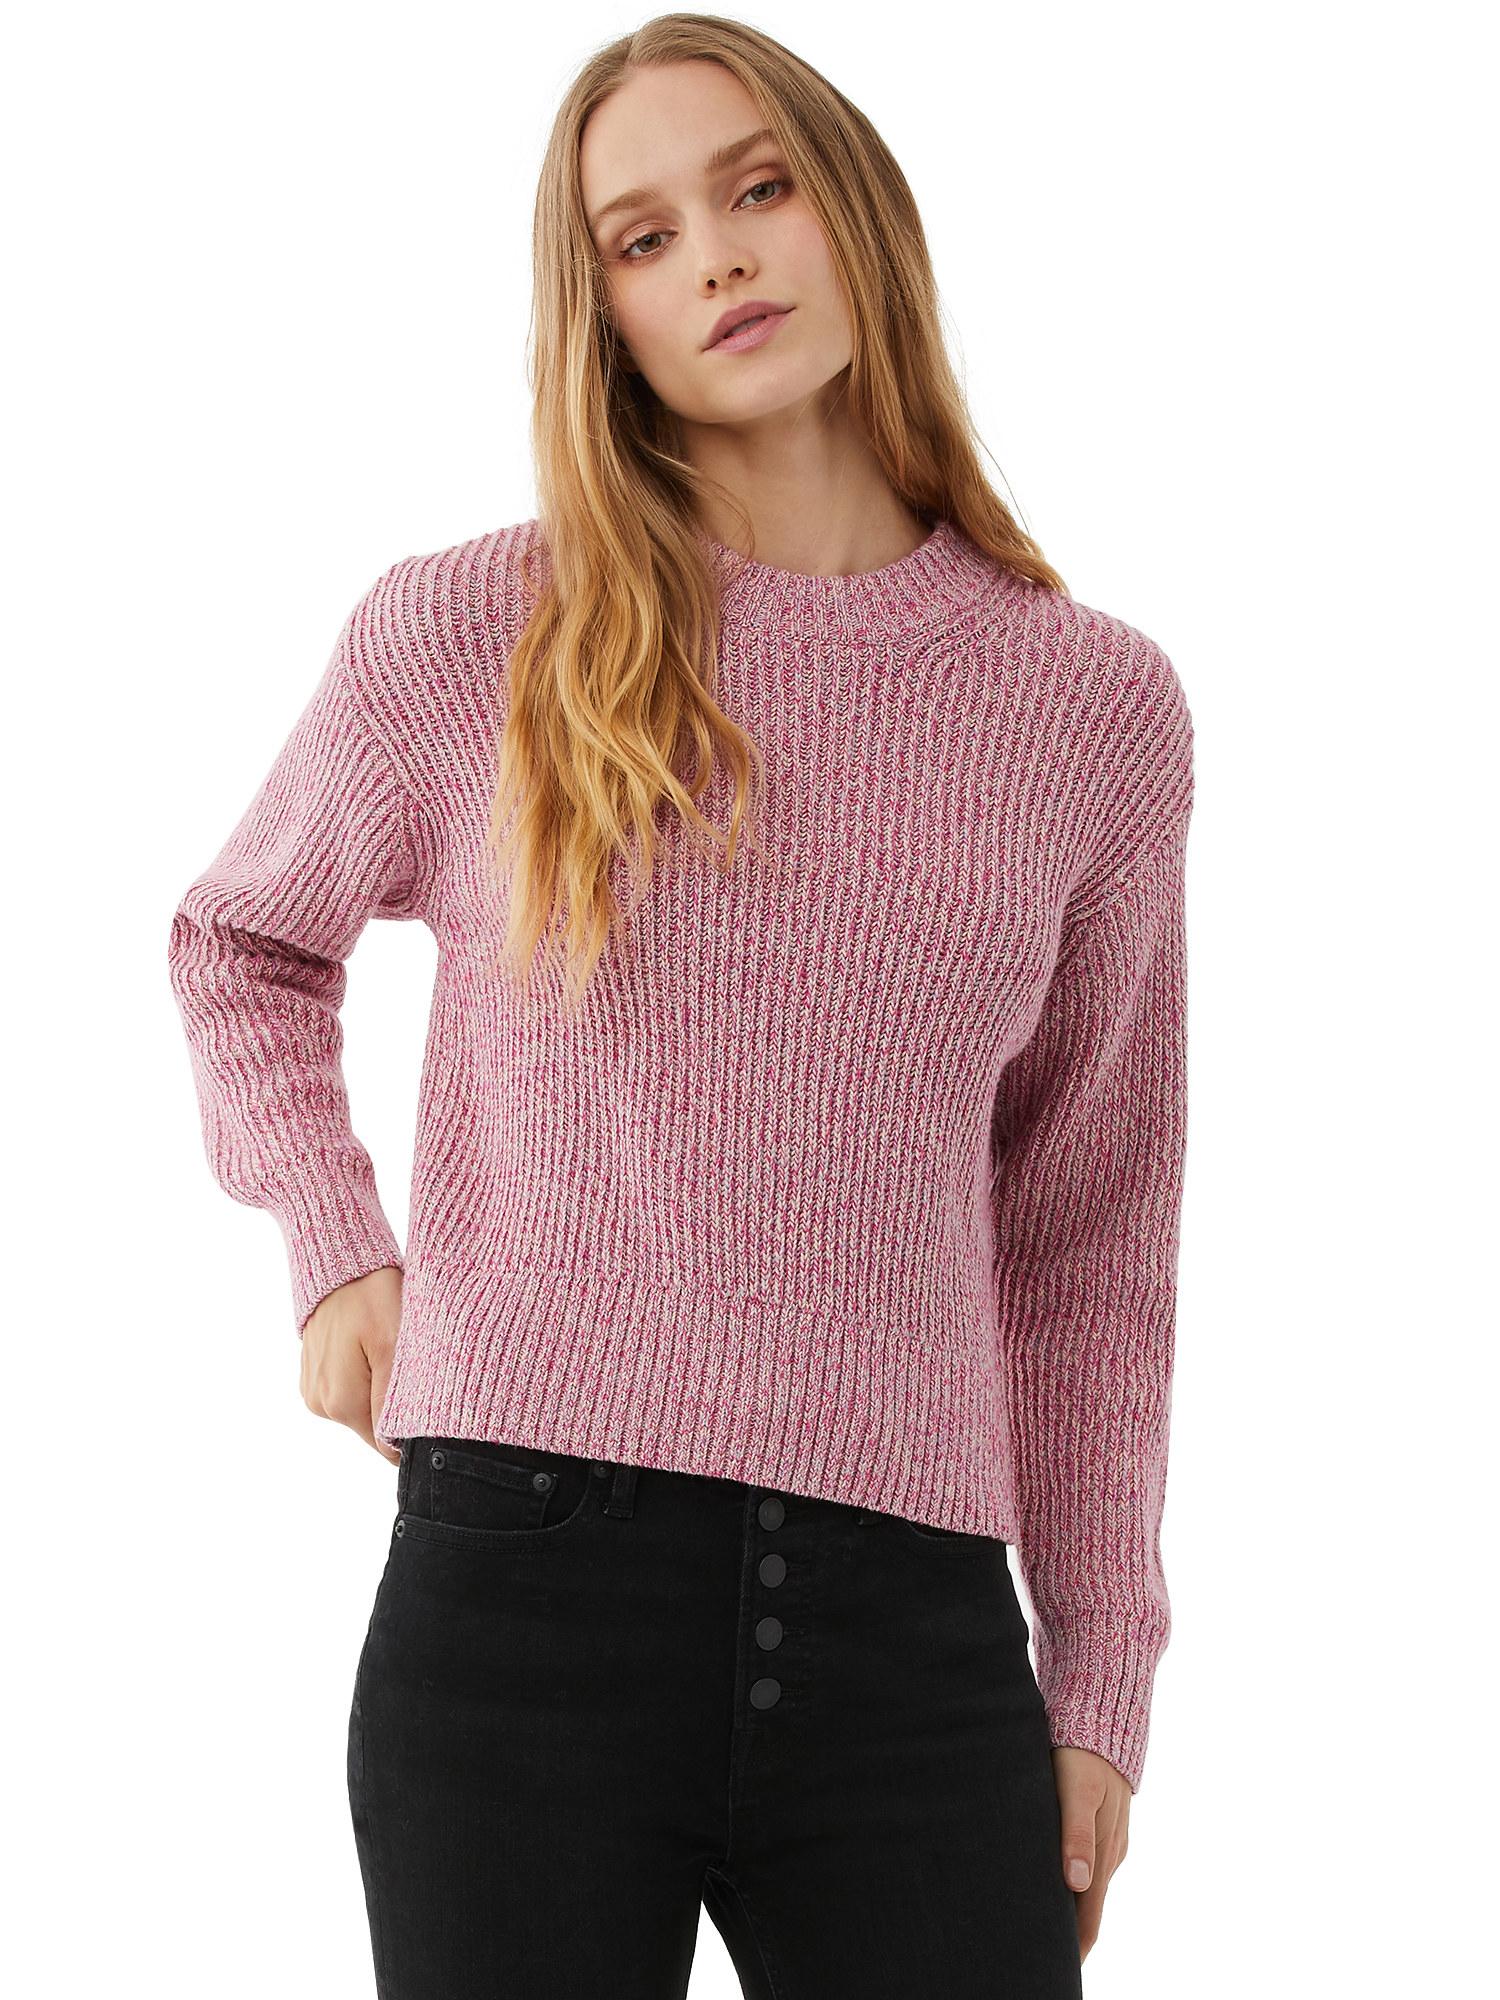 Model wearing pink crewneck sweater